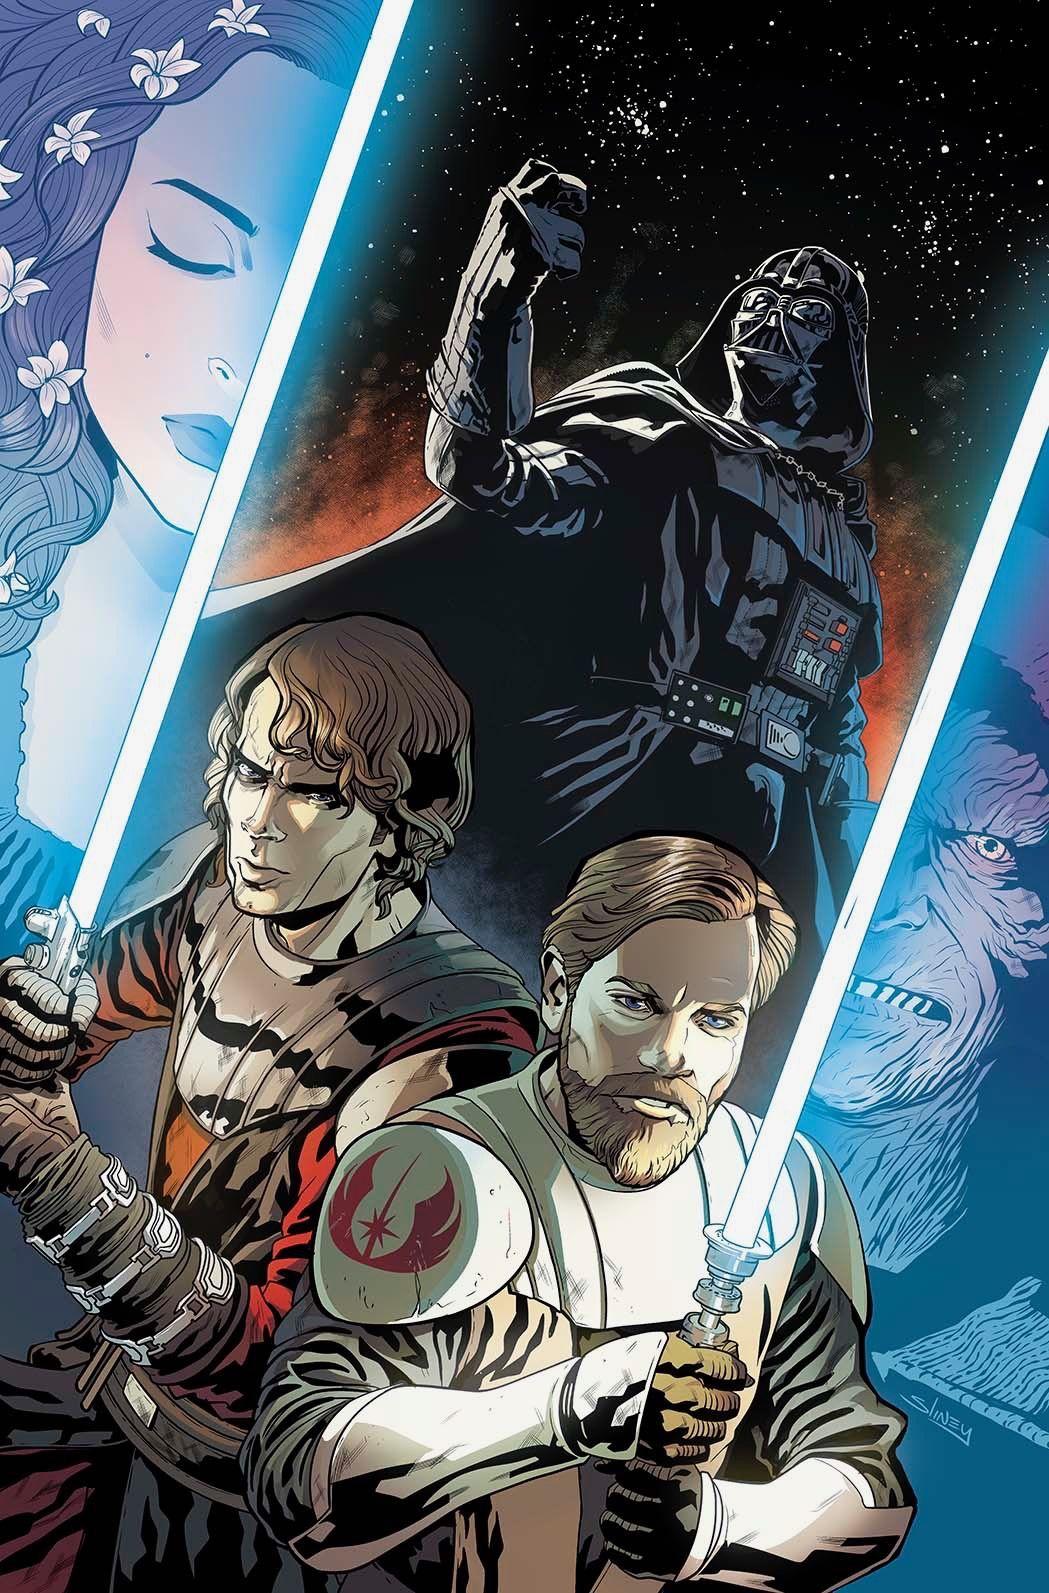 Clone Wars Star Wars Painting Star Wars Drawings Star Wars Art